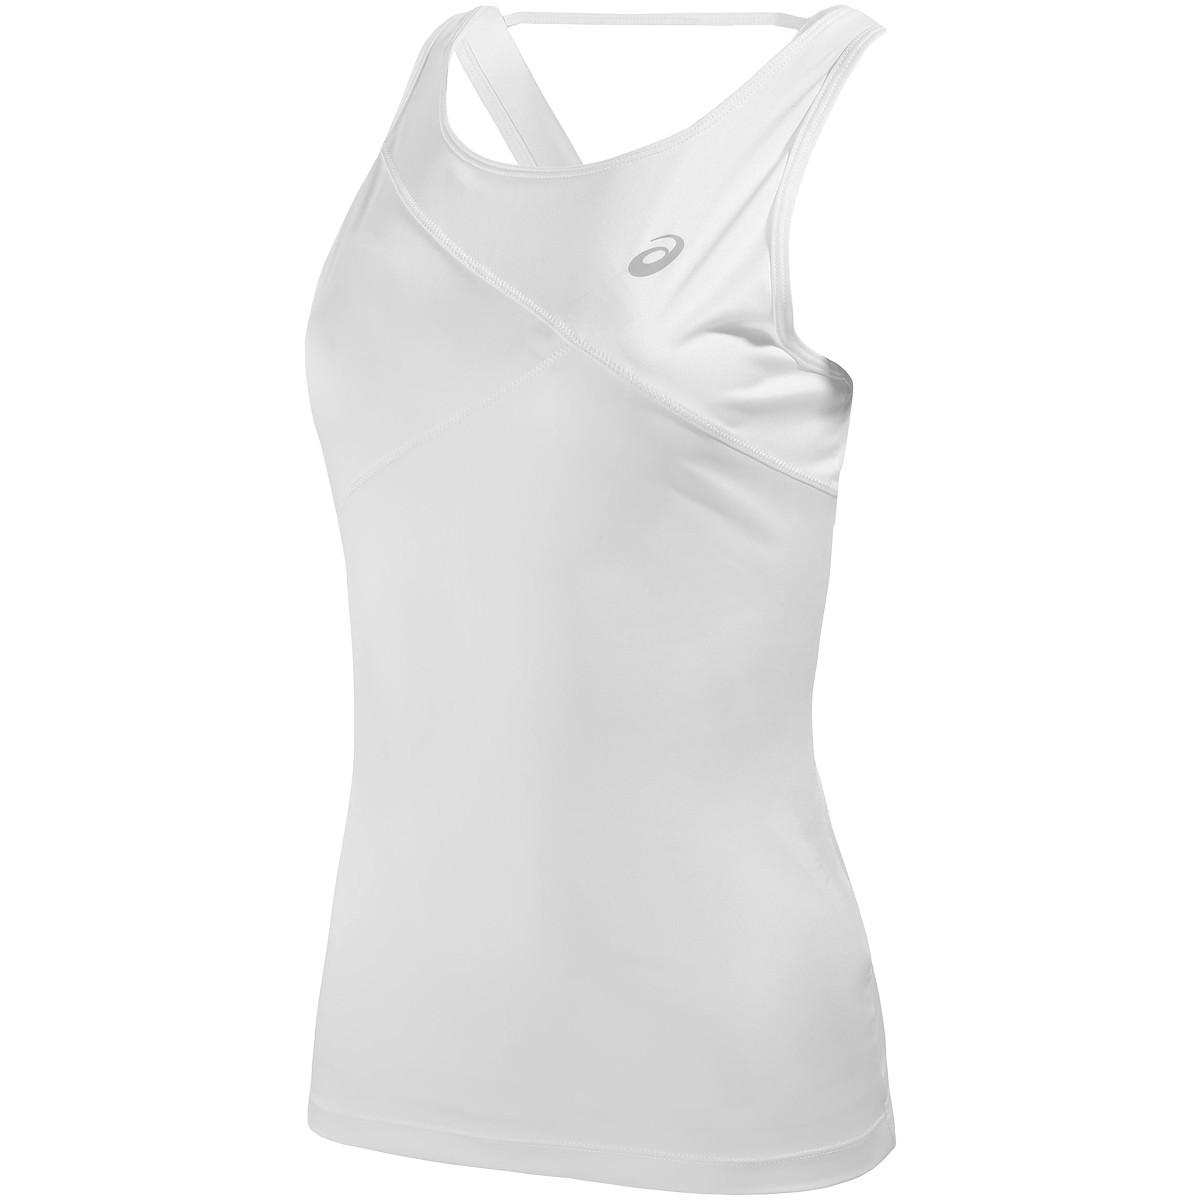 WOMEN'S ASICS CLUB TANK TOP - ASICS - Women's - Clothing | Tennispro